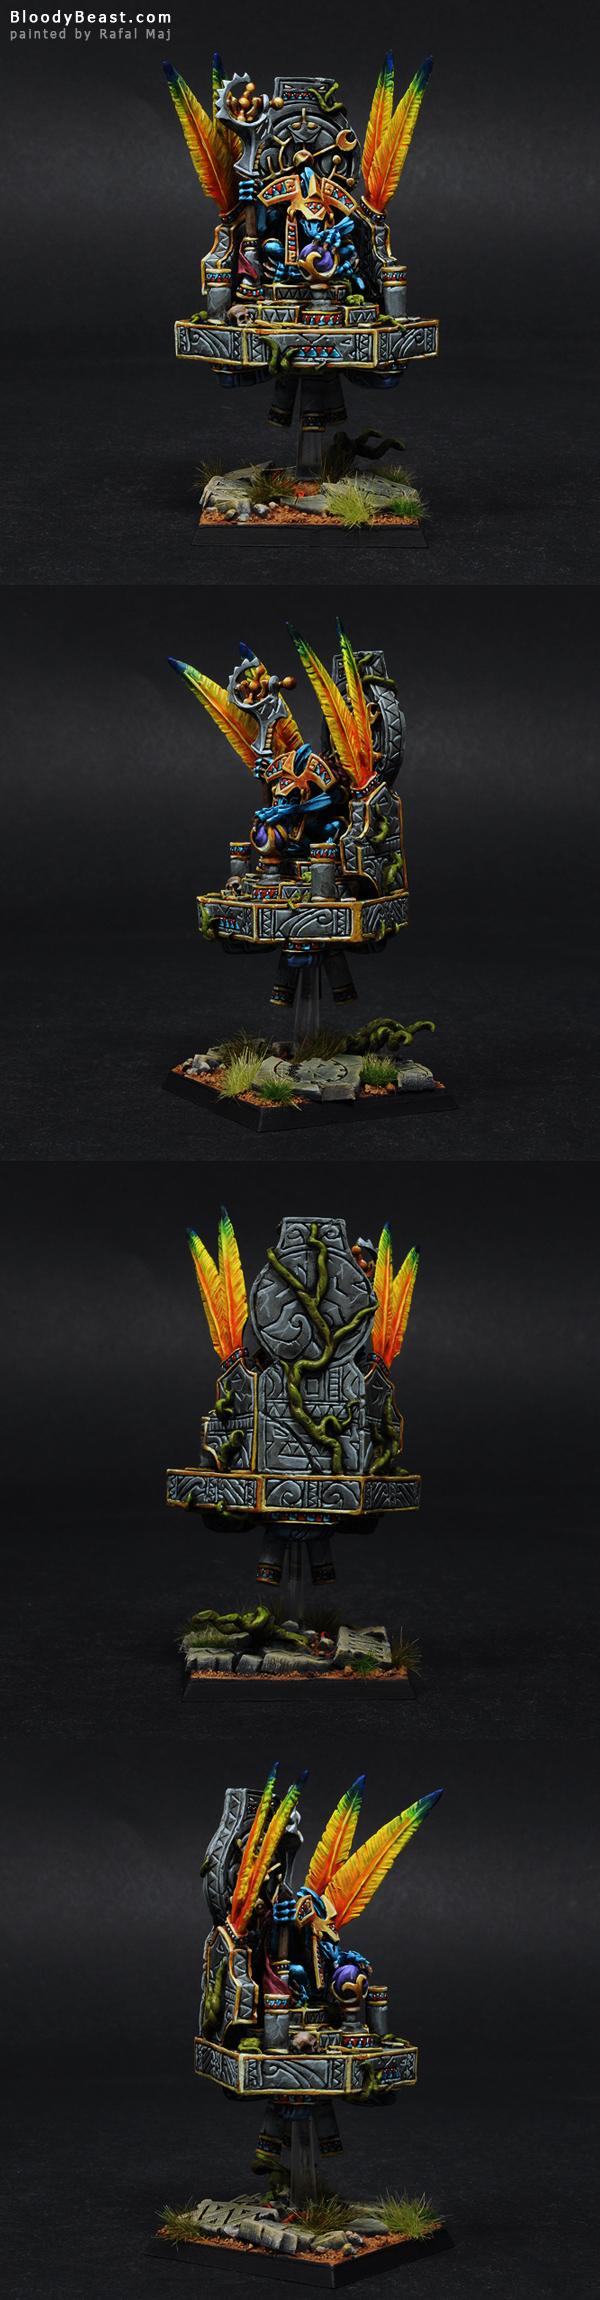 Lizardmen Tetto'Eko painted by Rafal Maj (BloodyBeast.com)